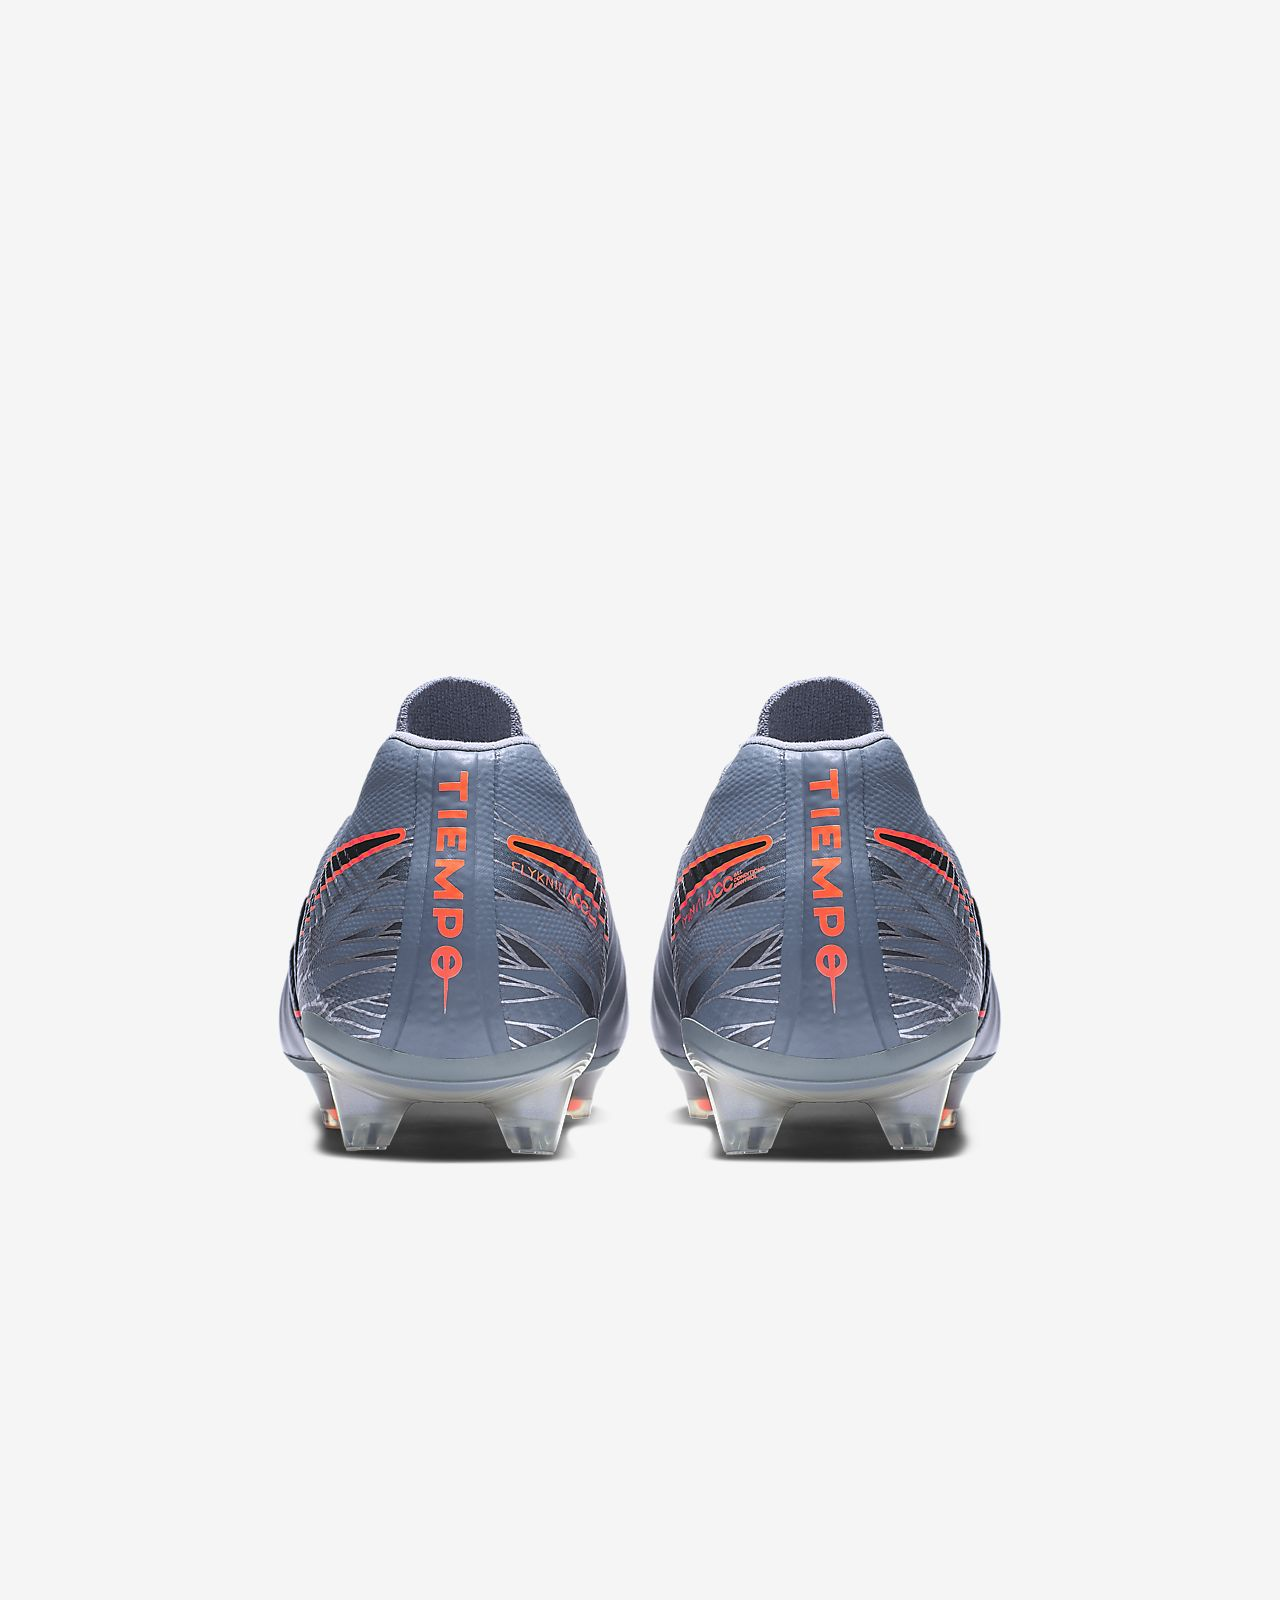 7f0aaad50da2 Nike Tiempo Legend 7 Elite FG Firm-Ground Soccer Cleat. Nike.com